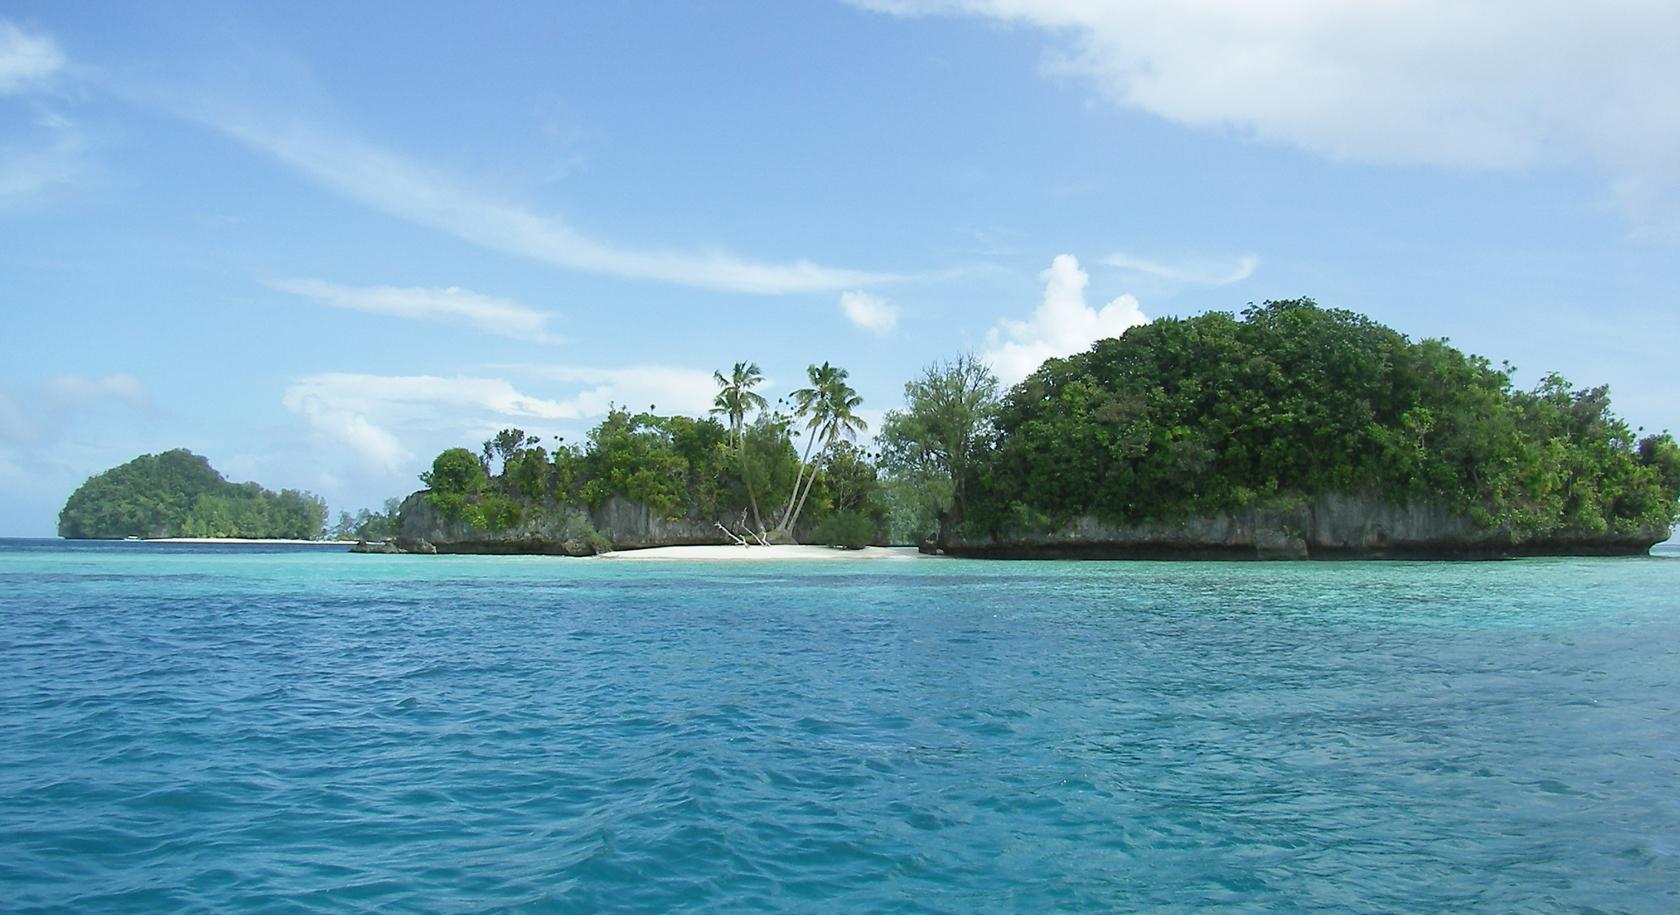 Palau-rock-islands20071222-1.jpg